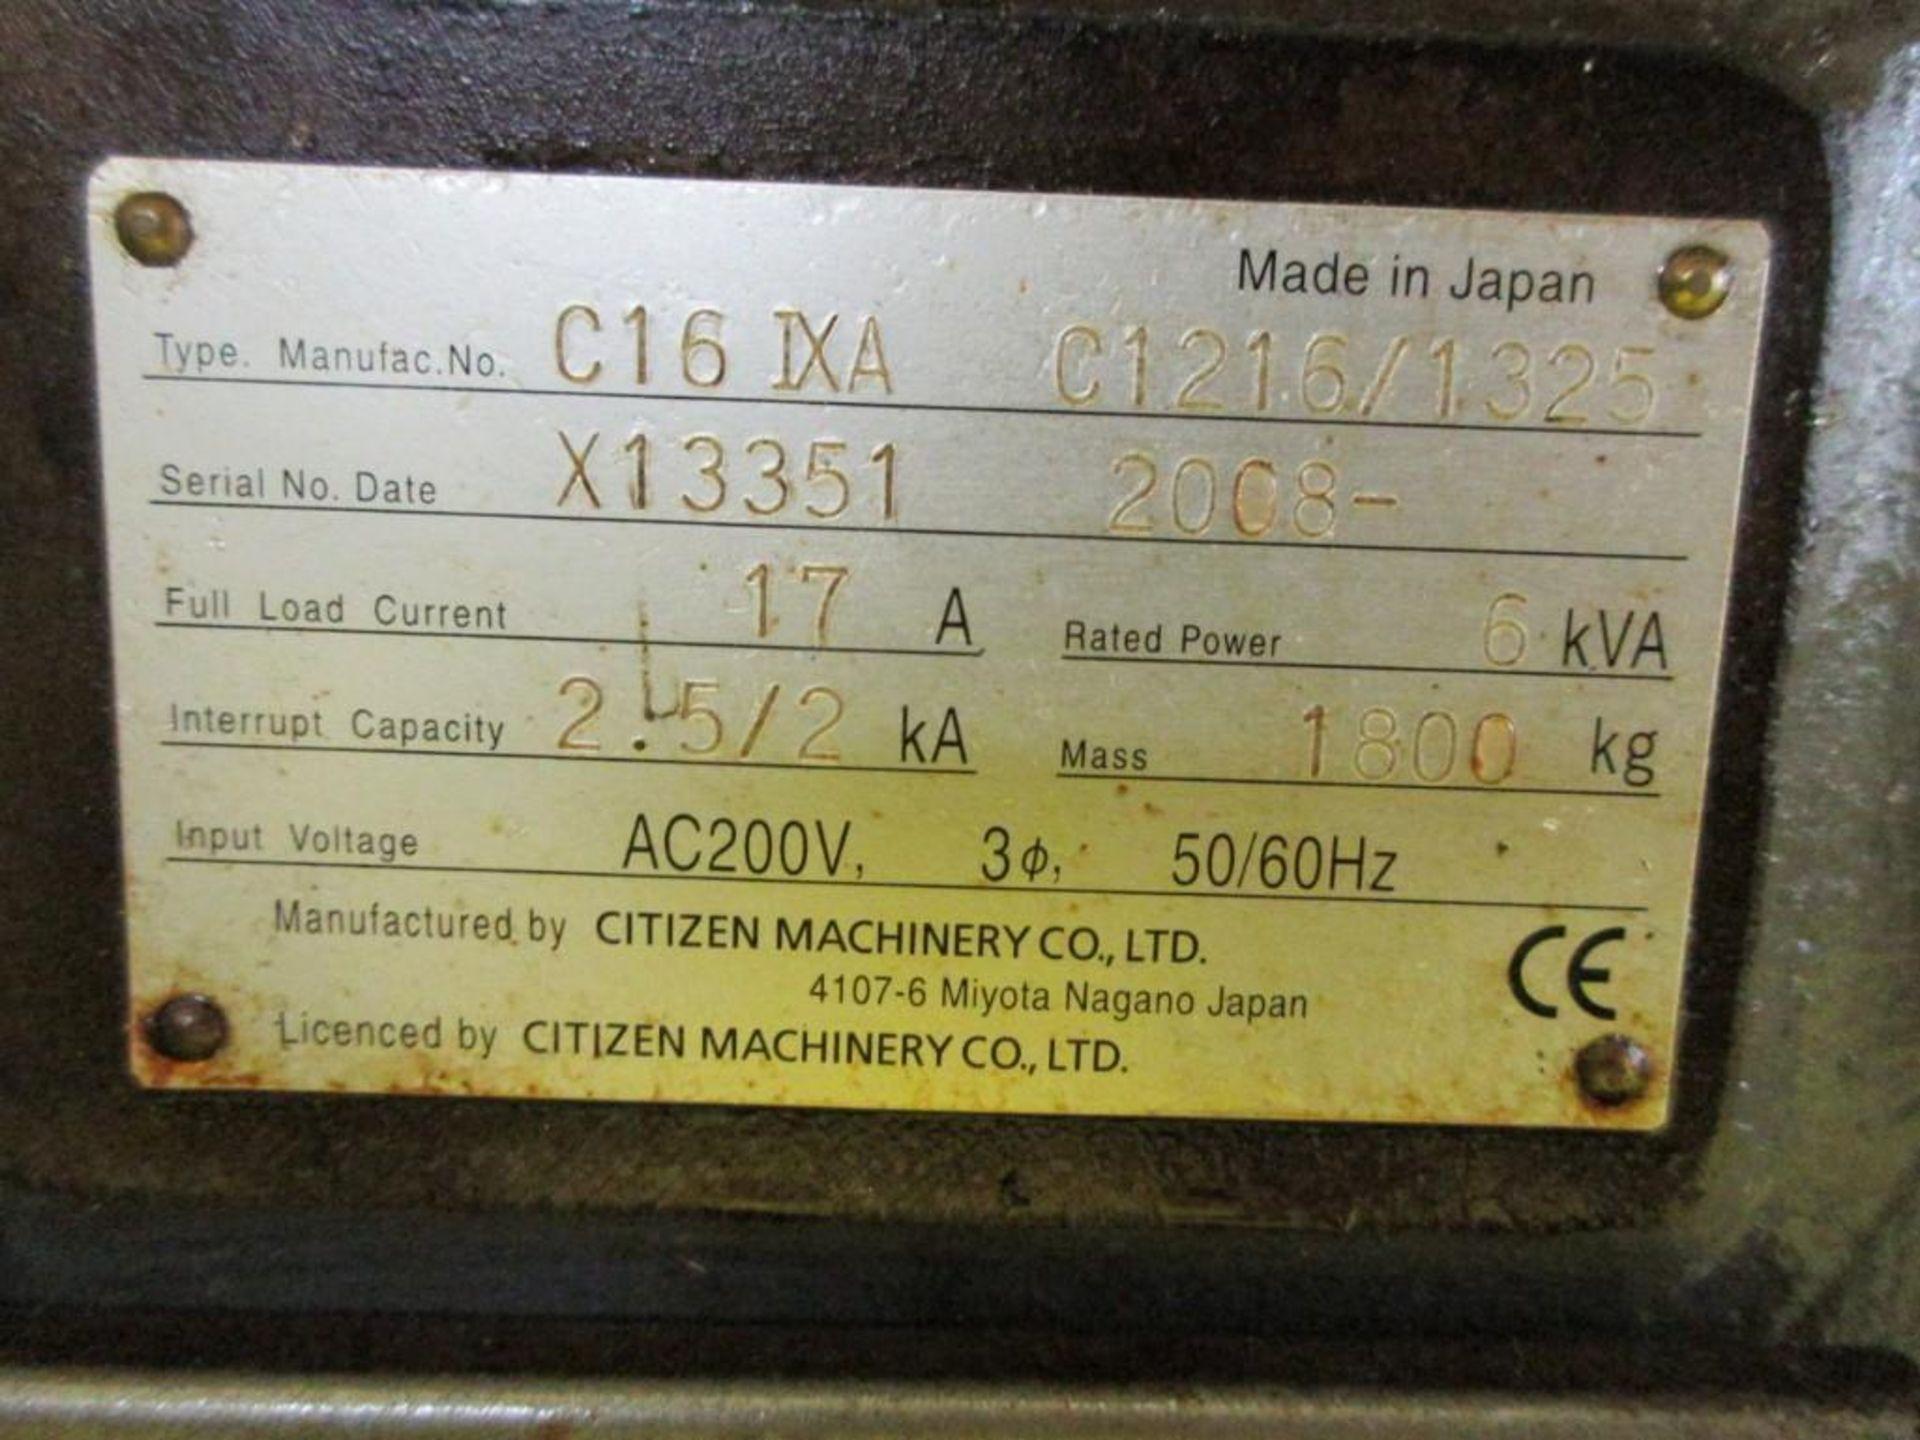 Lot 3 - CITIZEN MDL. C16-IX-1 SWISS-TYPE CNC LATHE